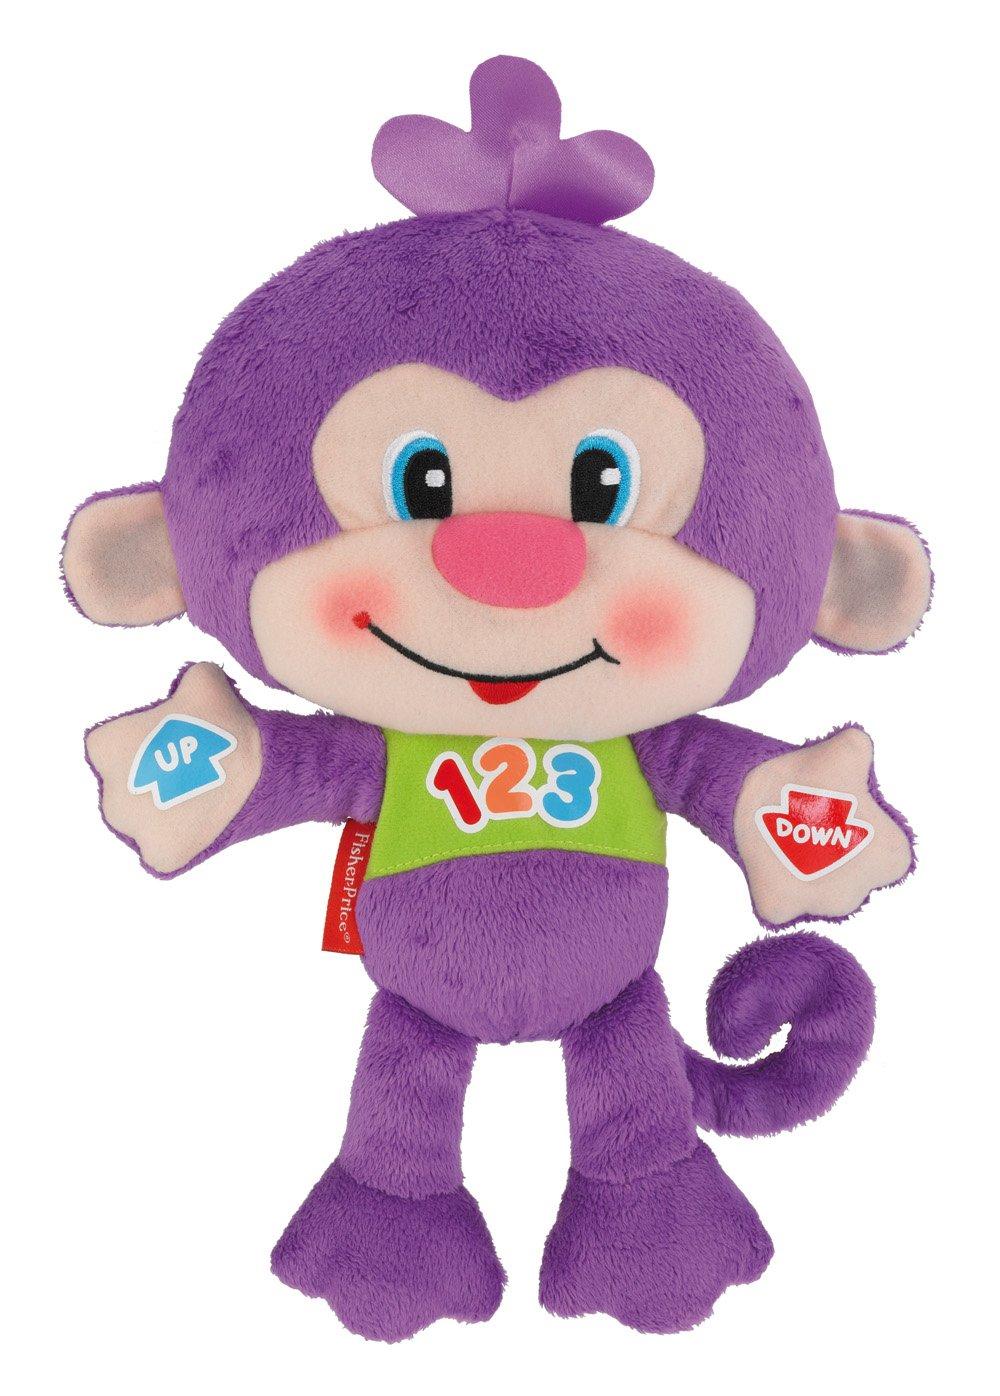 Fisher Price Monito aprende los contrarios Mattel BCG